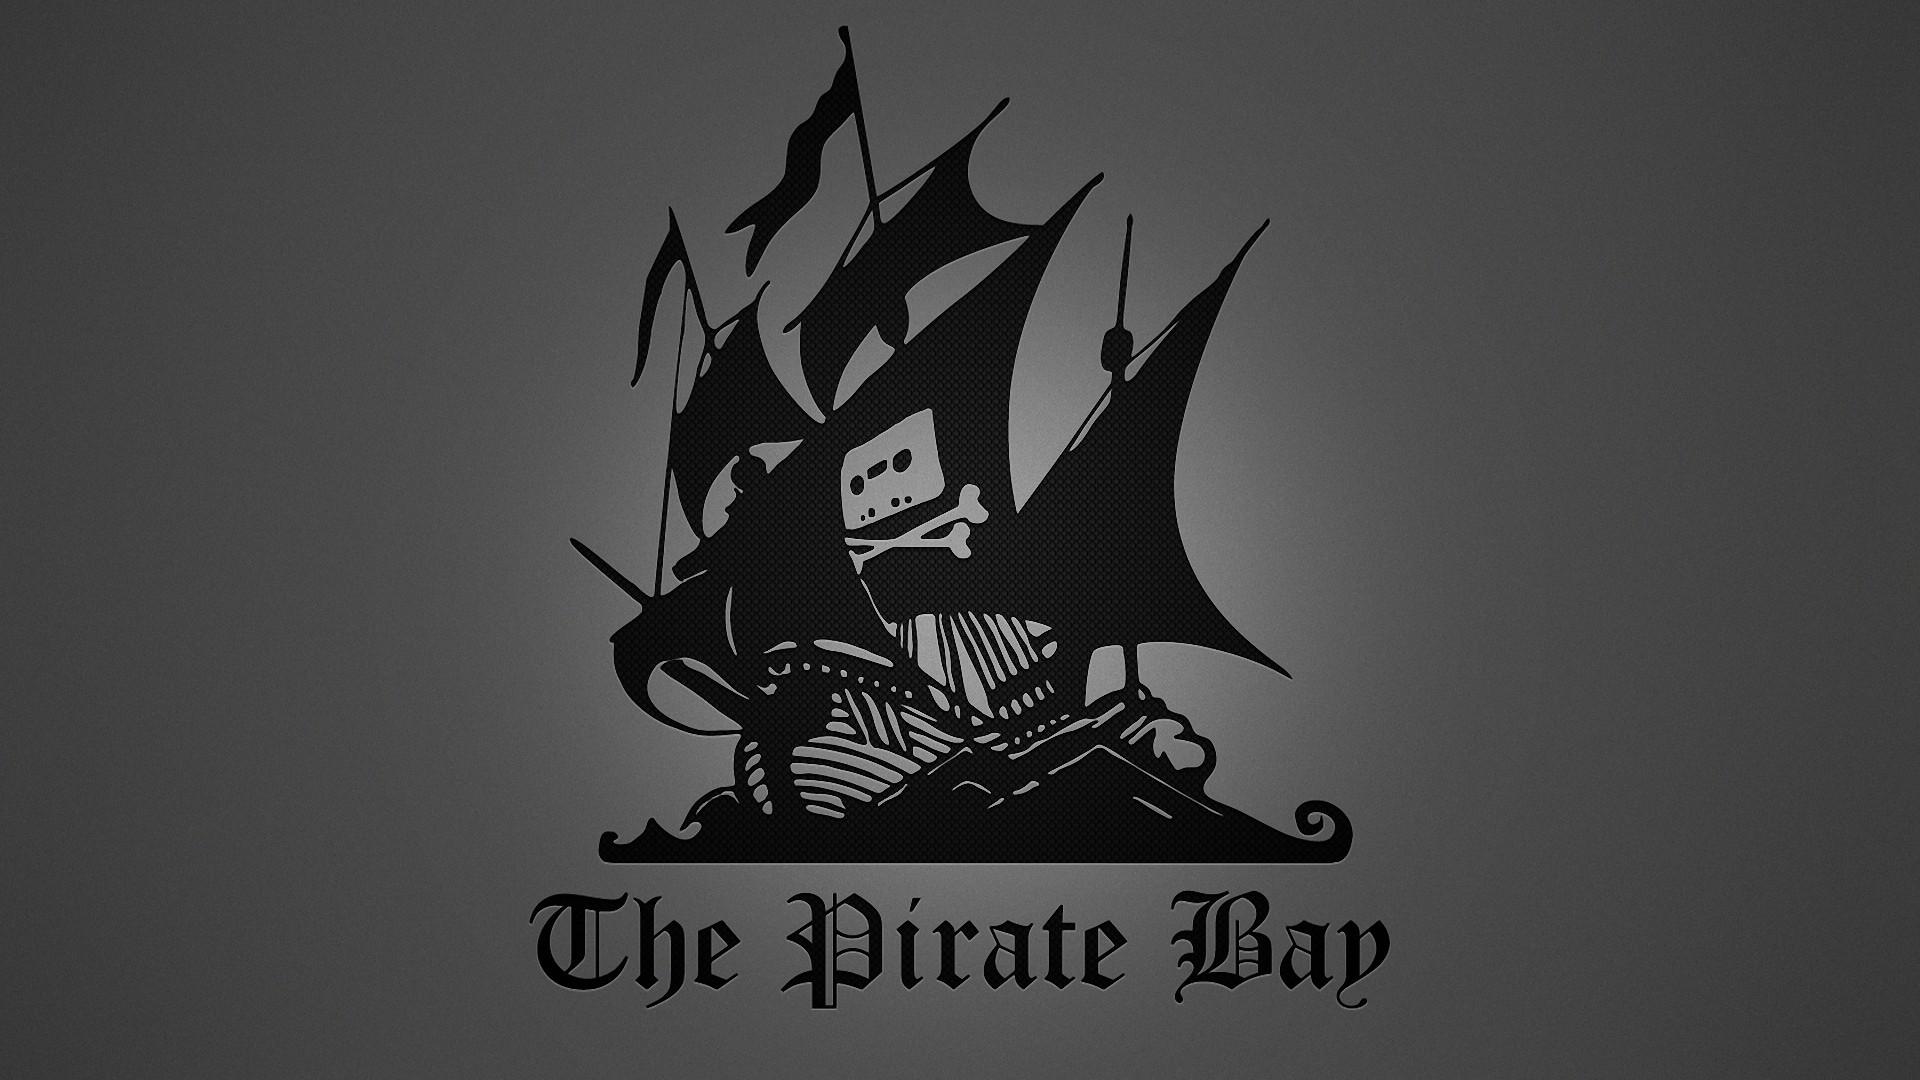 Wallpaper The Pirate Bay Fond Ecran Hd